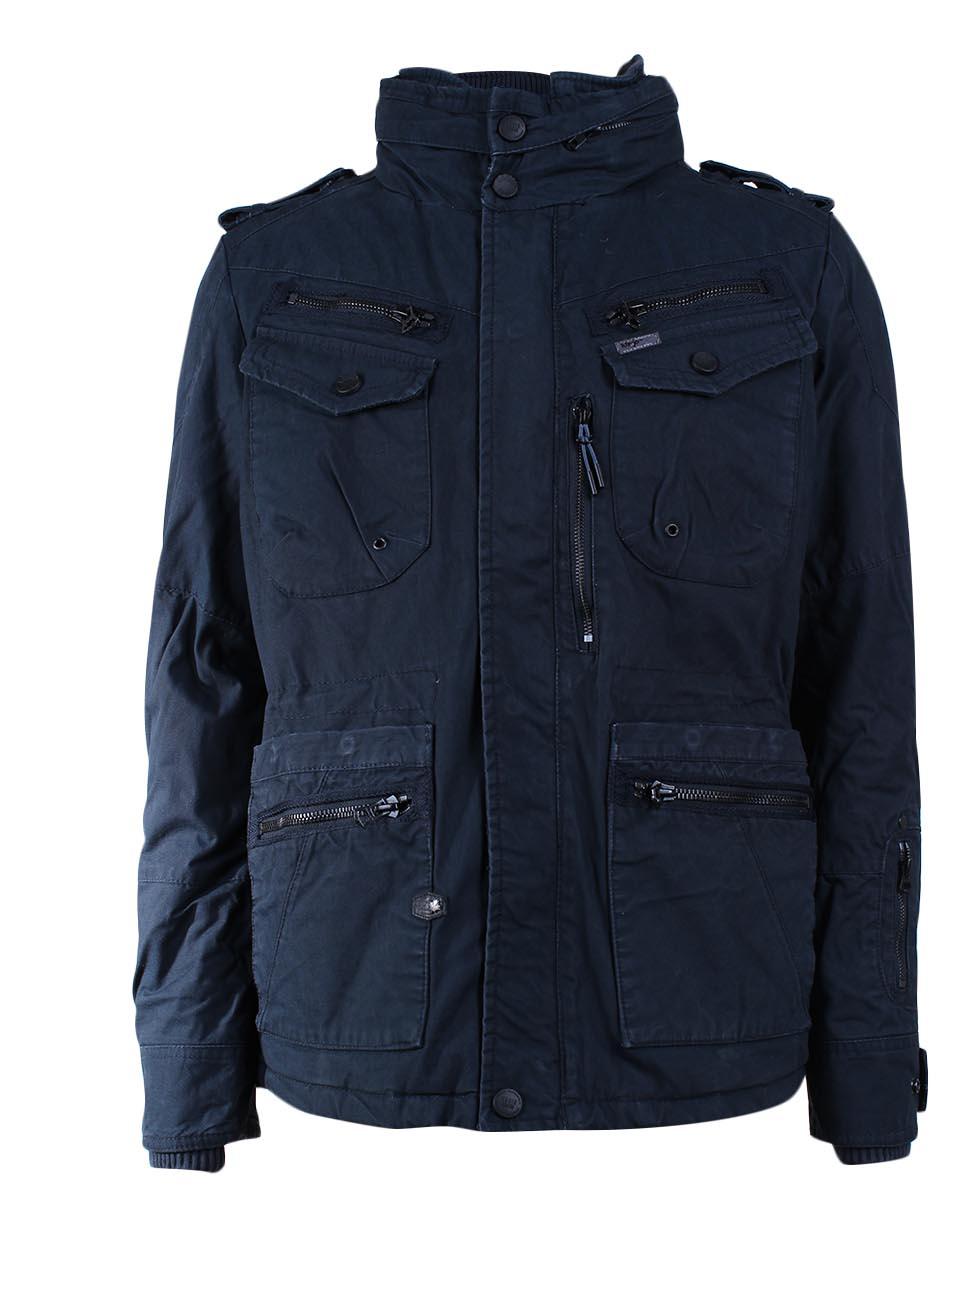 khujo herren winterjacke major grau blau charcoal dark blue kaufen jeans direct de. Black Bedroom Furniture Sets. Home Design Ideas